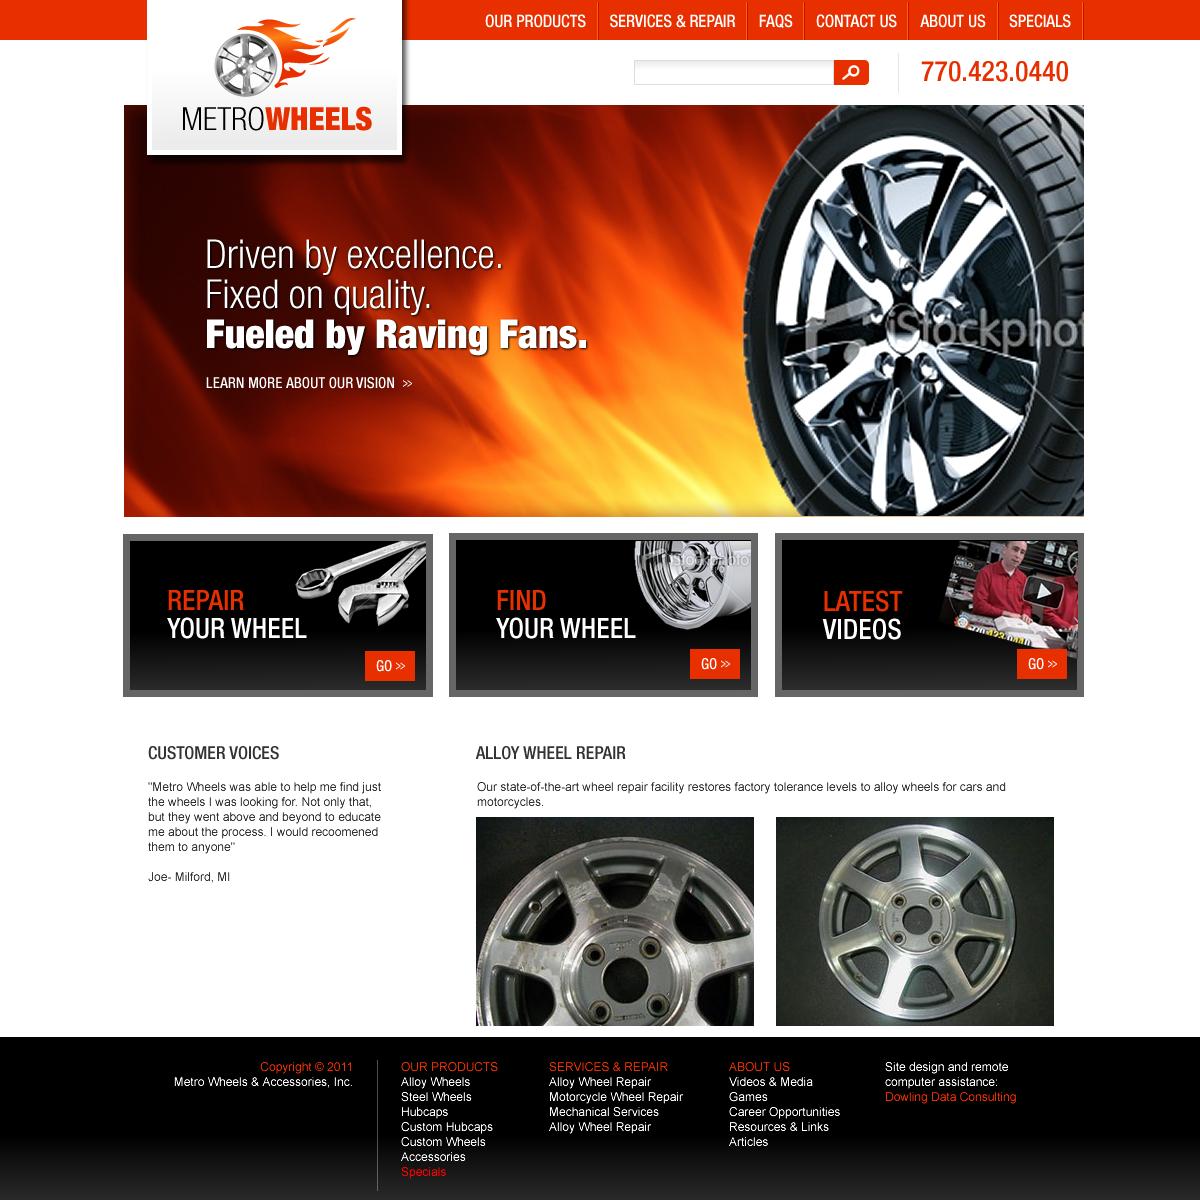 Dowling Data Consulting • Website & Logo Design: Metro